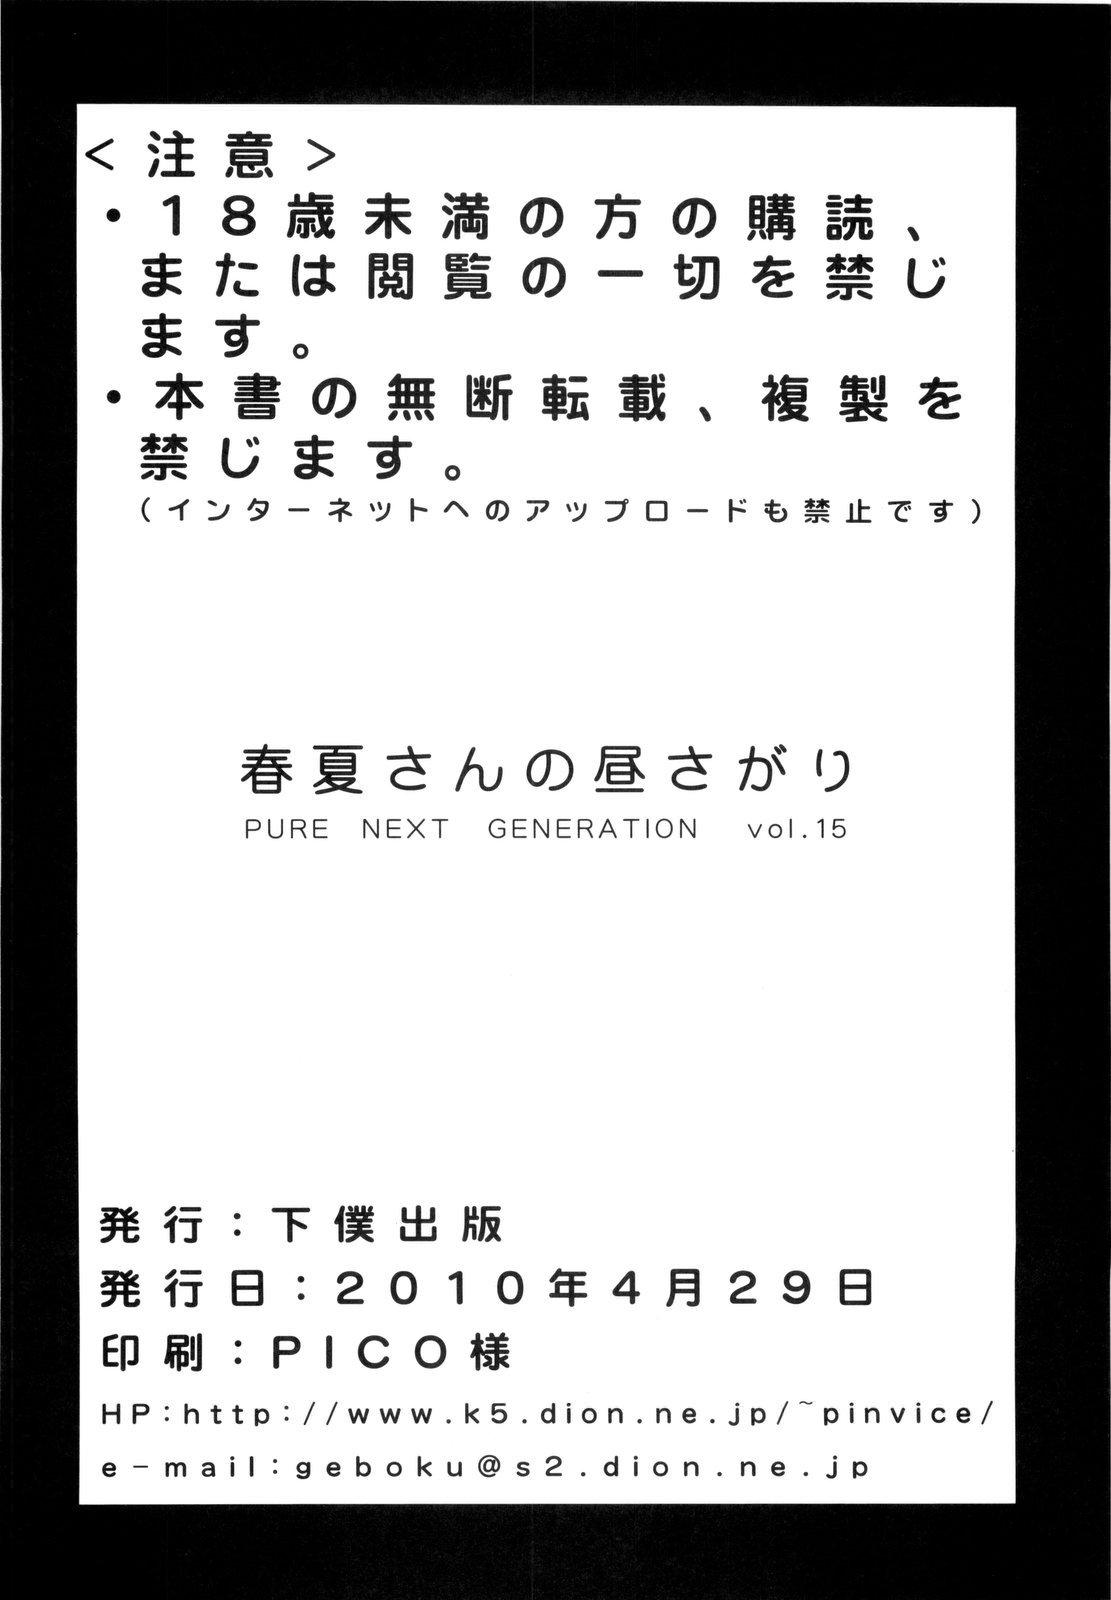 PURE NEXT GENERATION Vol.15 Haruka-san no Hirusagari 33